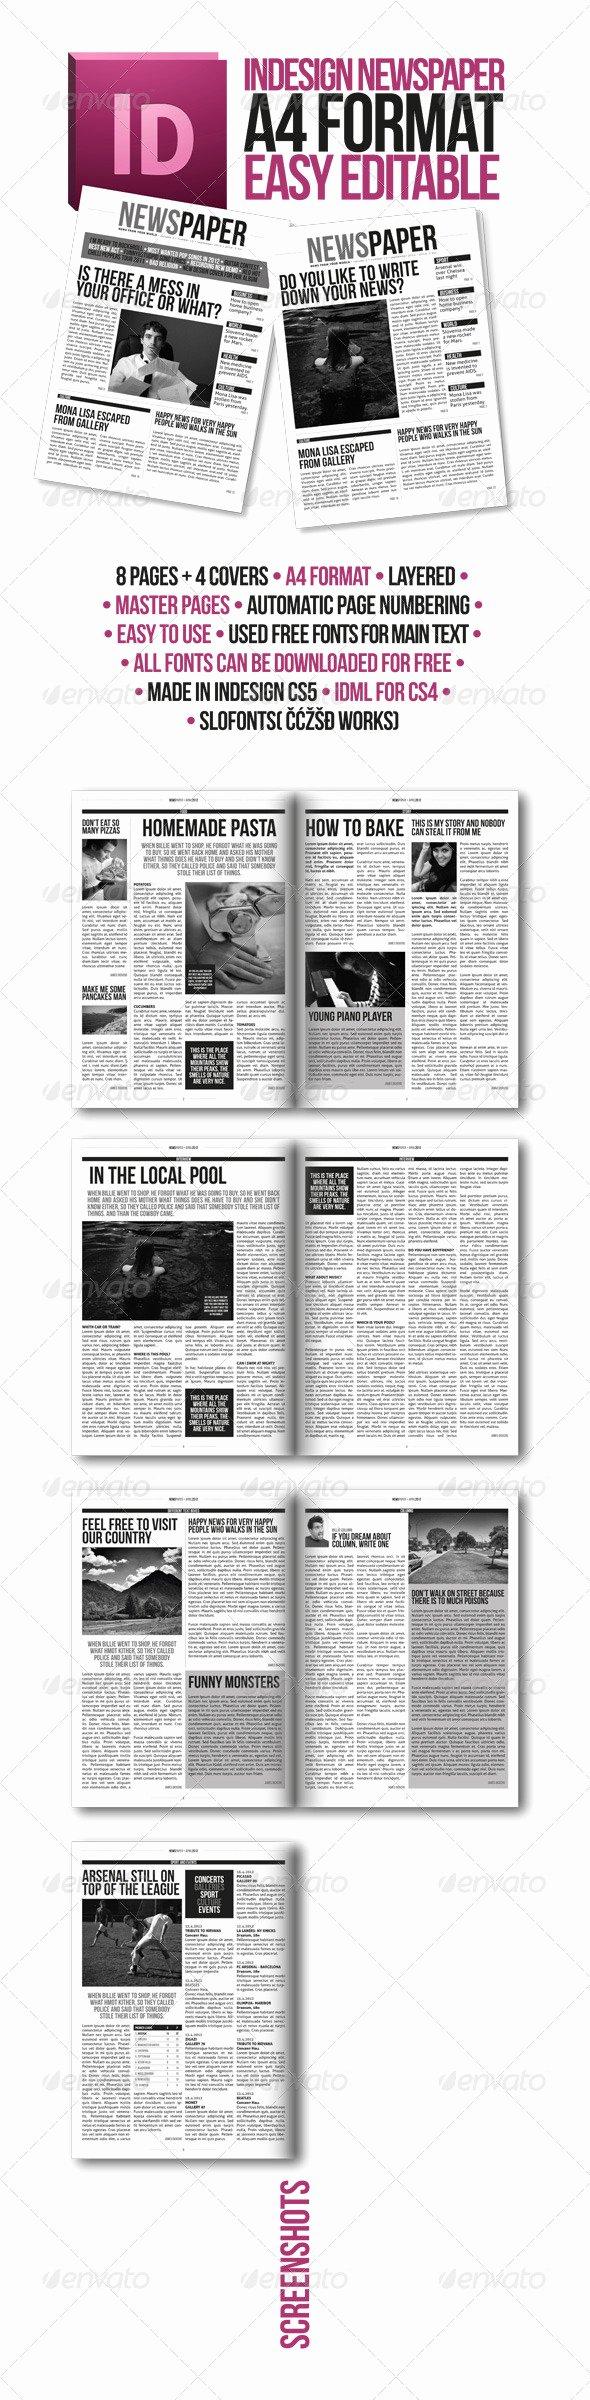 Newspaper Template Indesign Free Beautiful Indesign Modern Newspaper Magazine Template A4 by Zigazi83